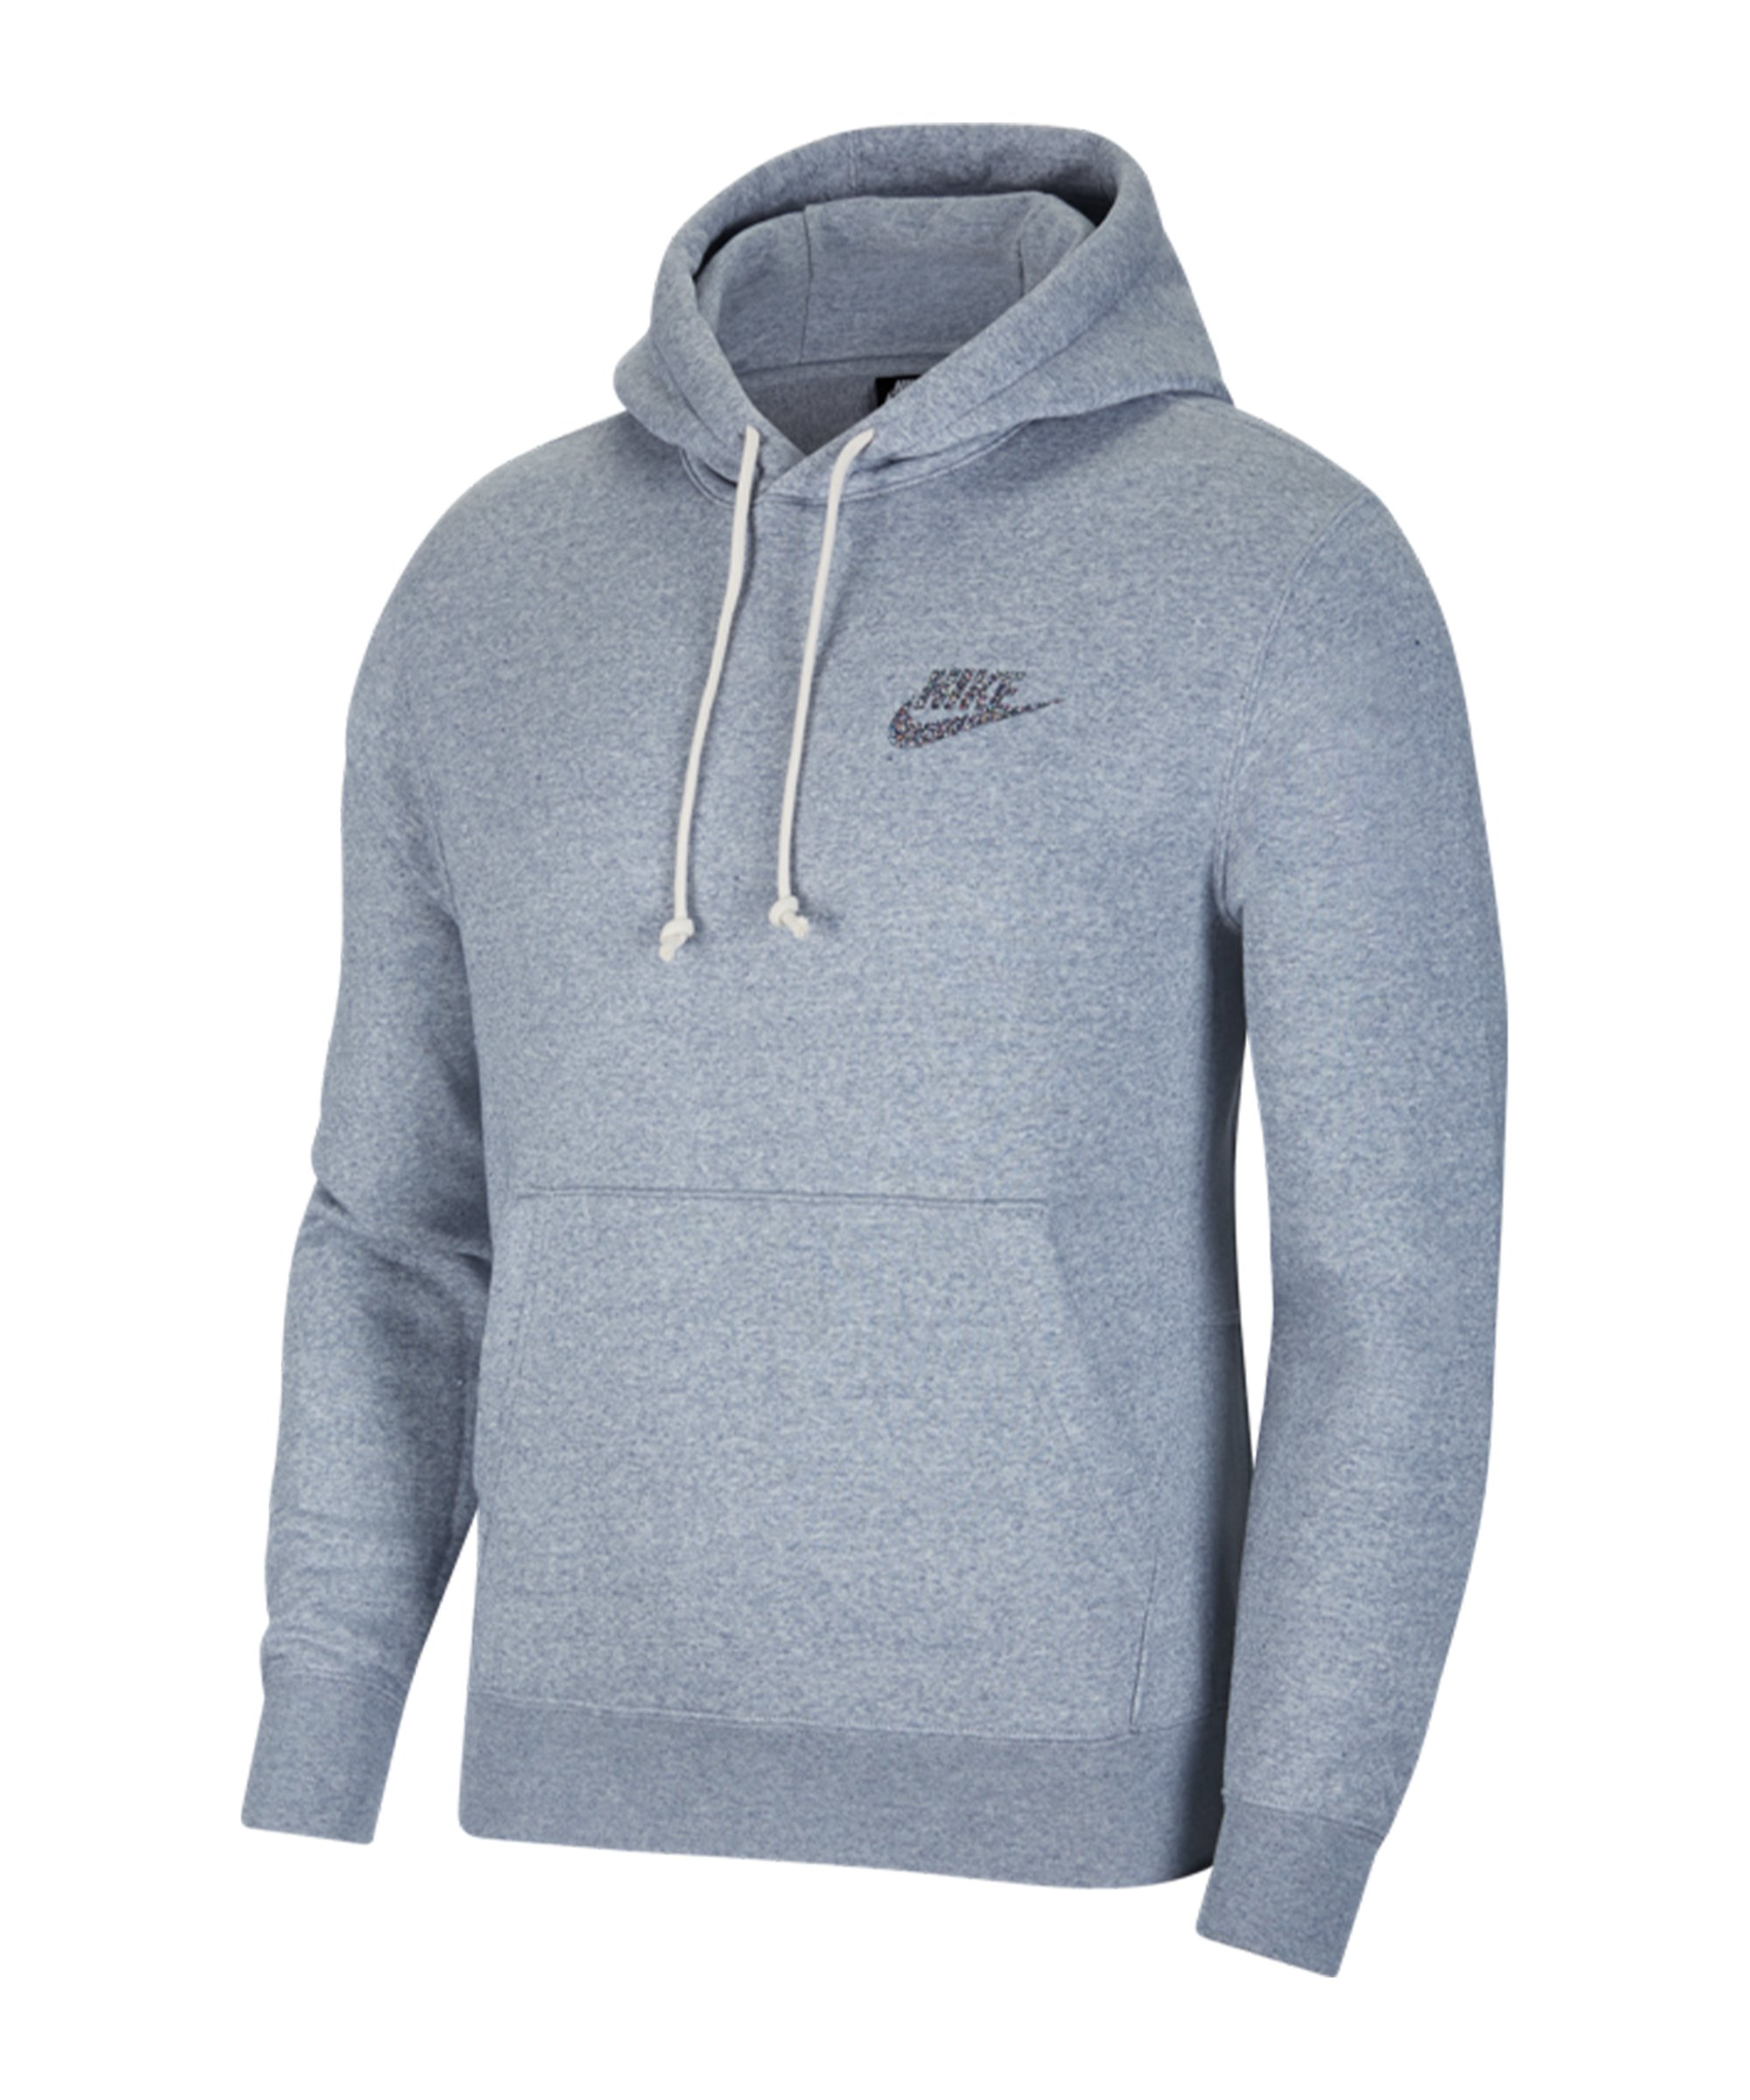 Nike Grind Hoody Grau F905 - grau